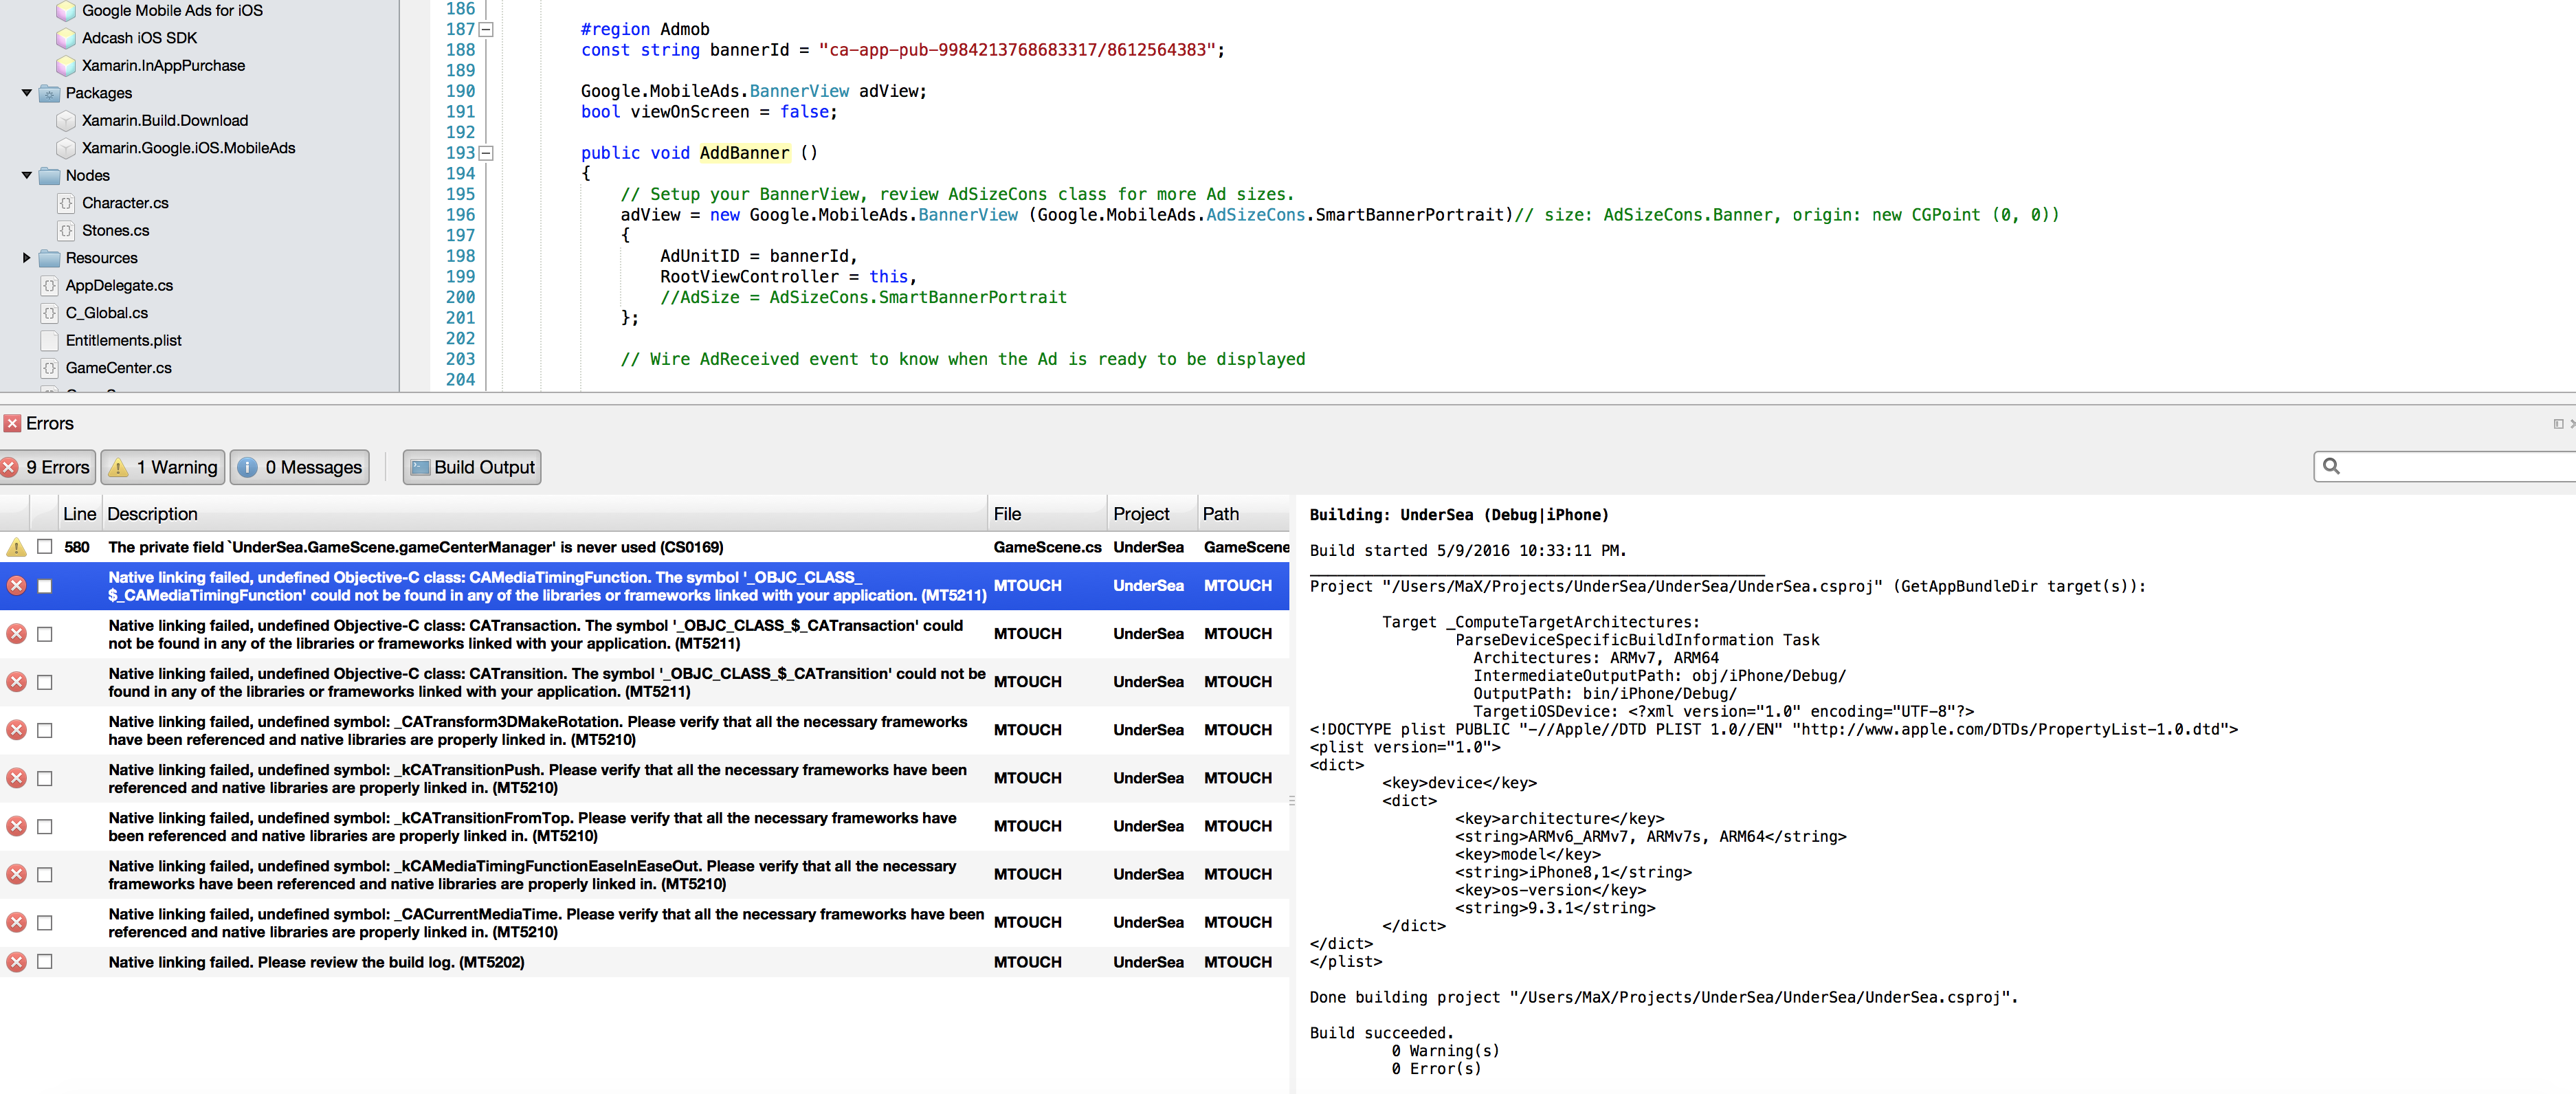 googleAd component error on spritekit - Native Linking errors